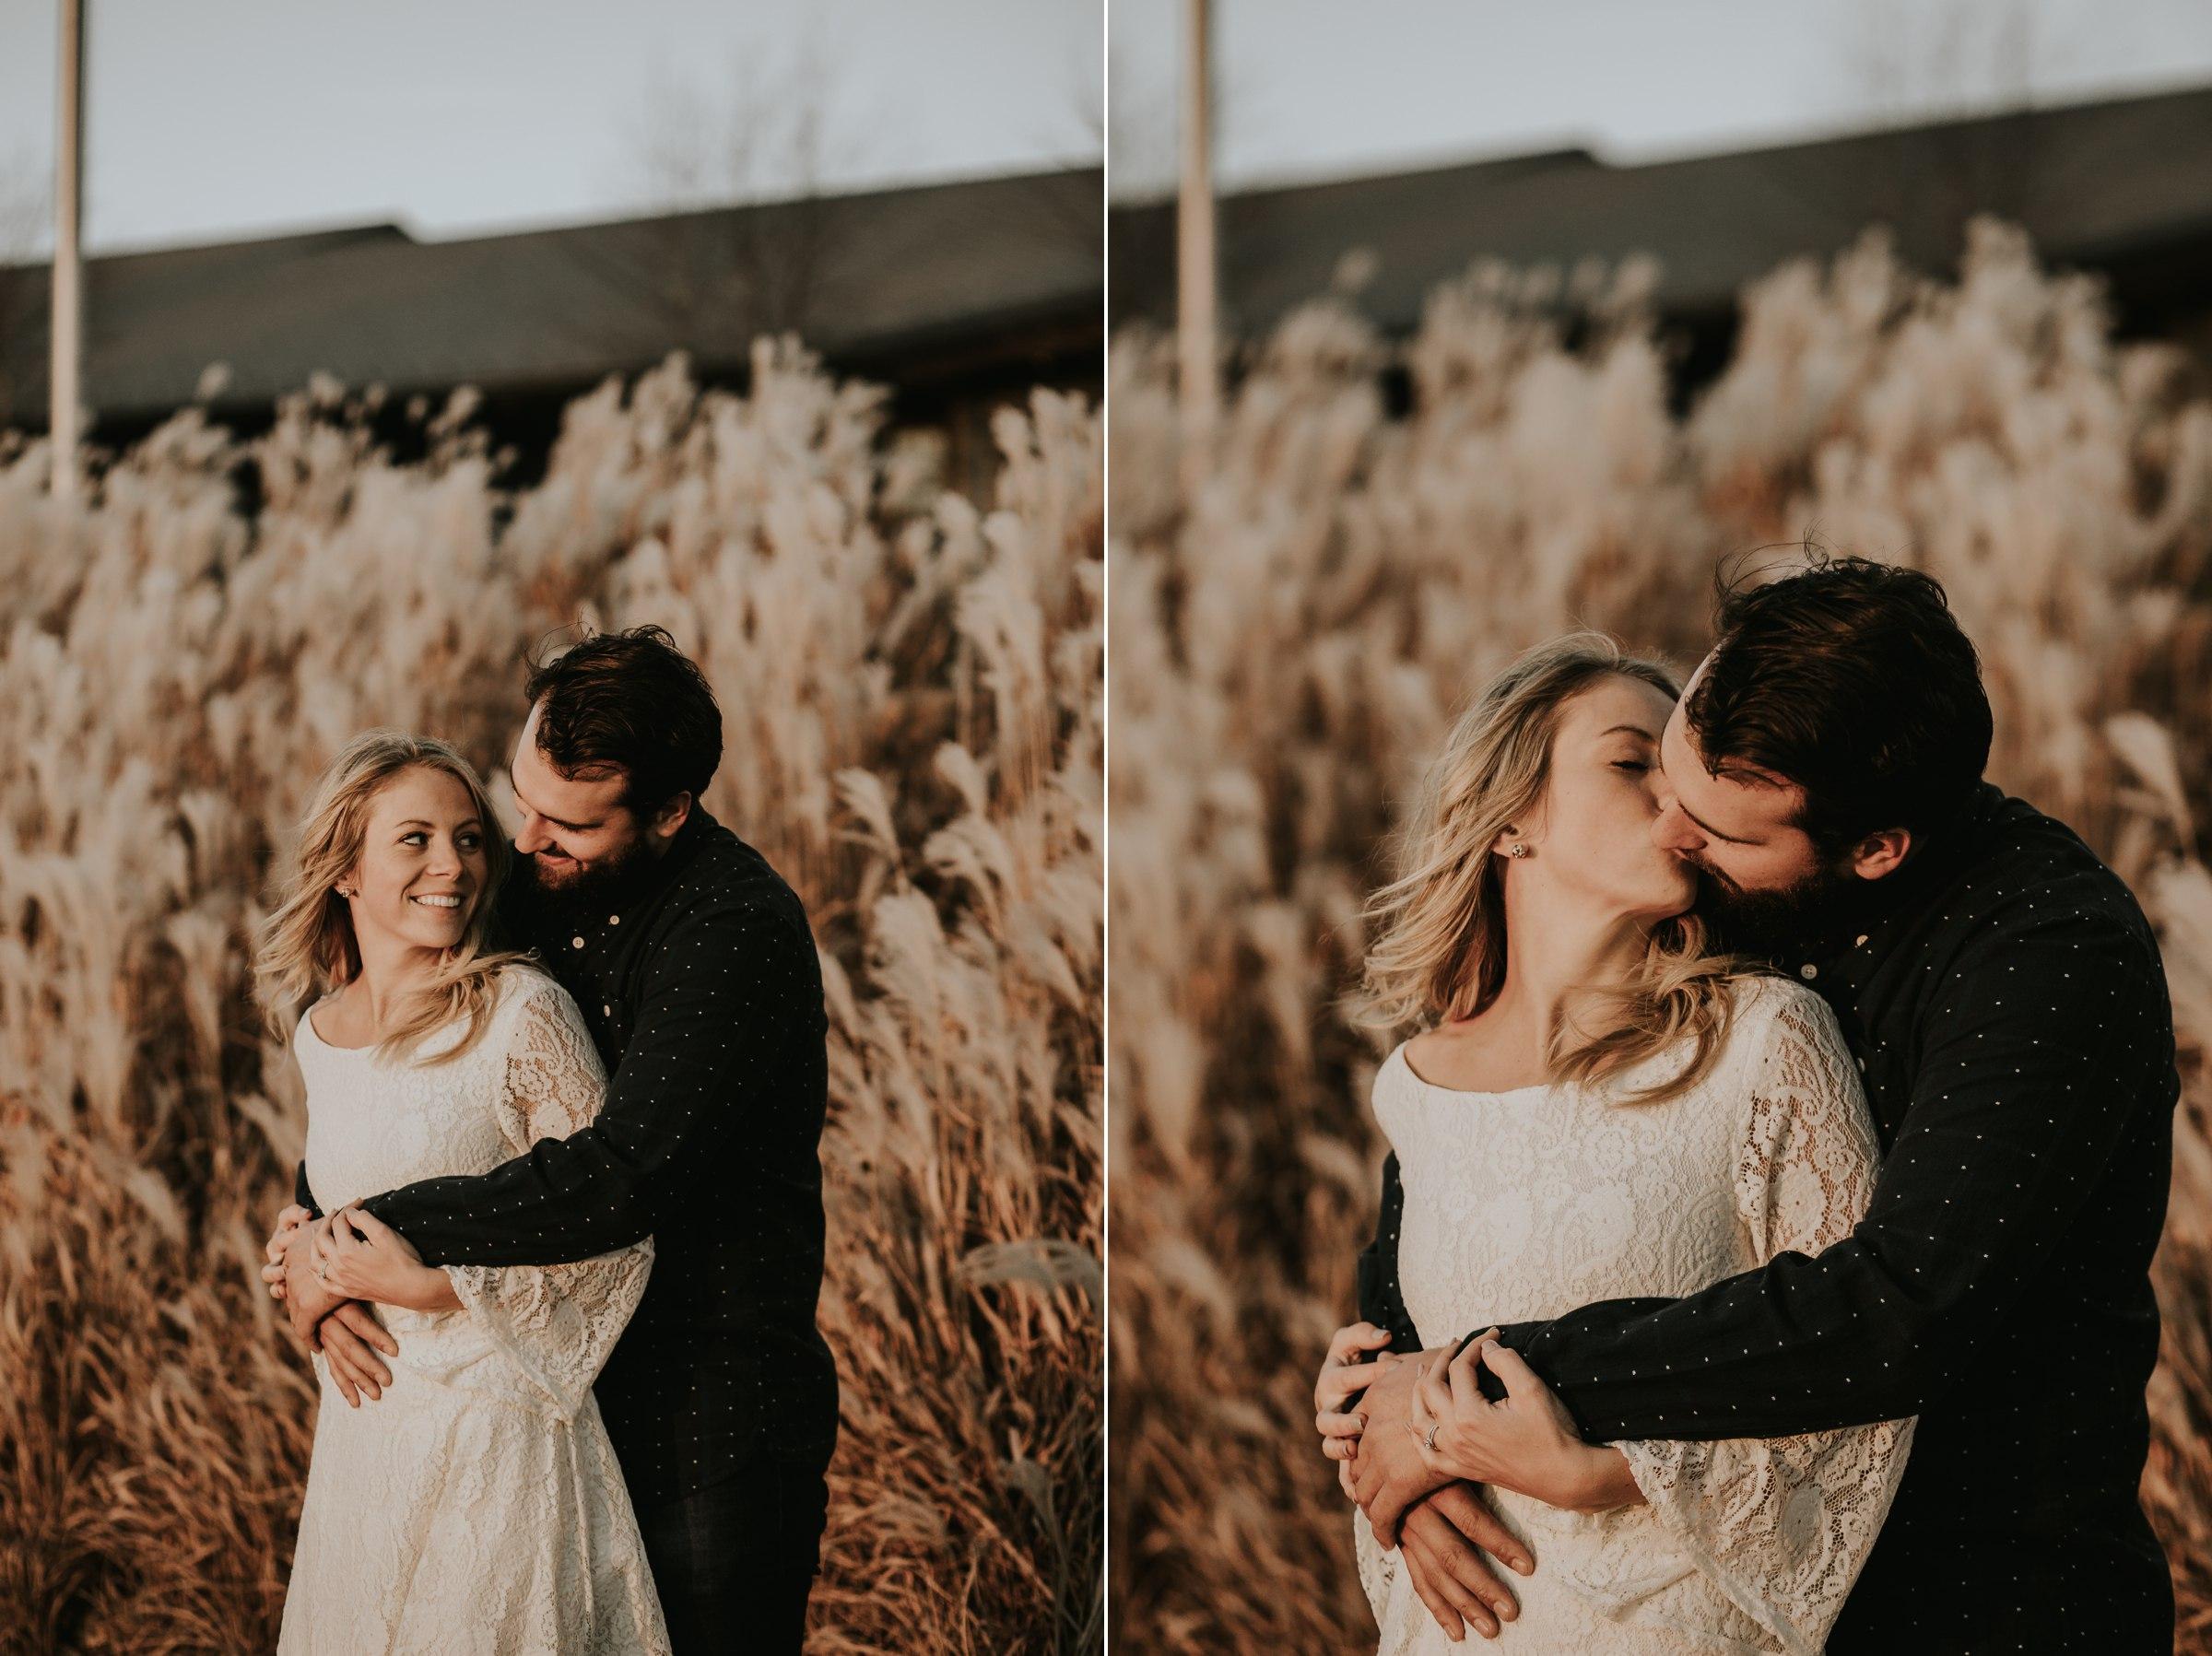 caitlin and drew blog minneapolis minnesota texas austin wedding elopement destination intimate best photographer_0128.jpg